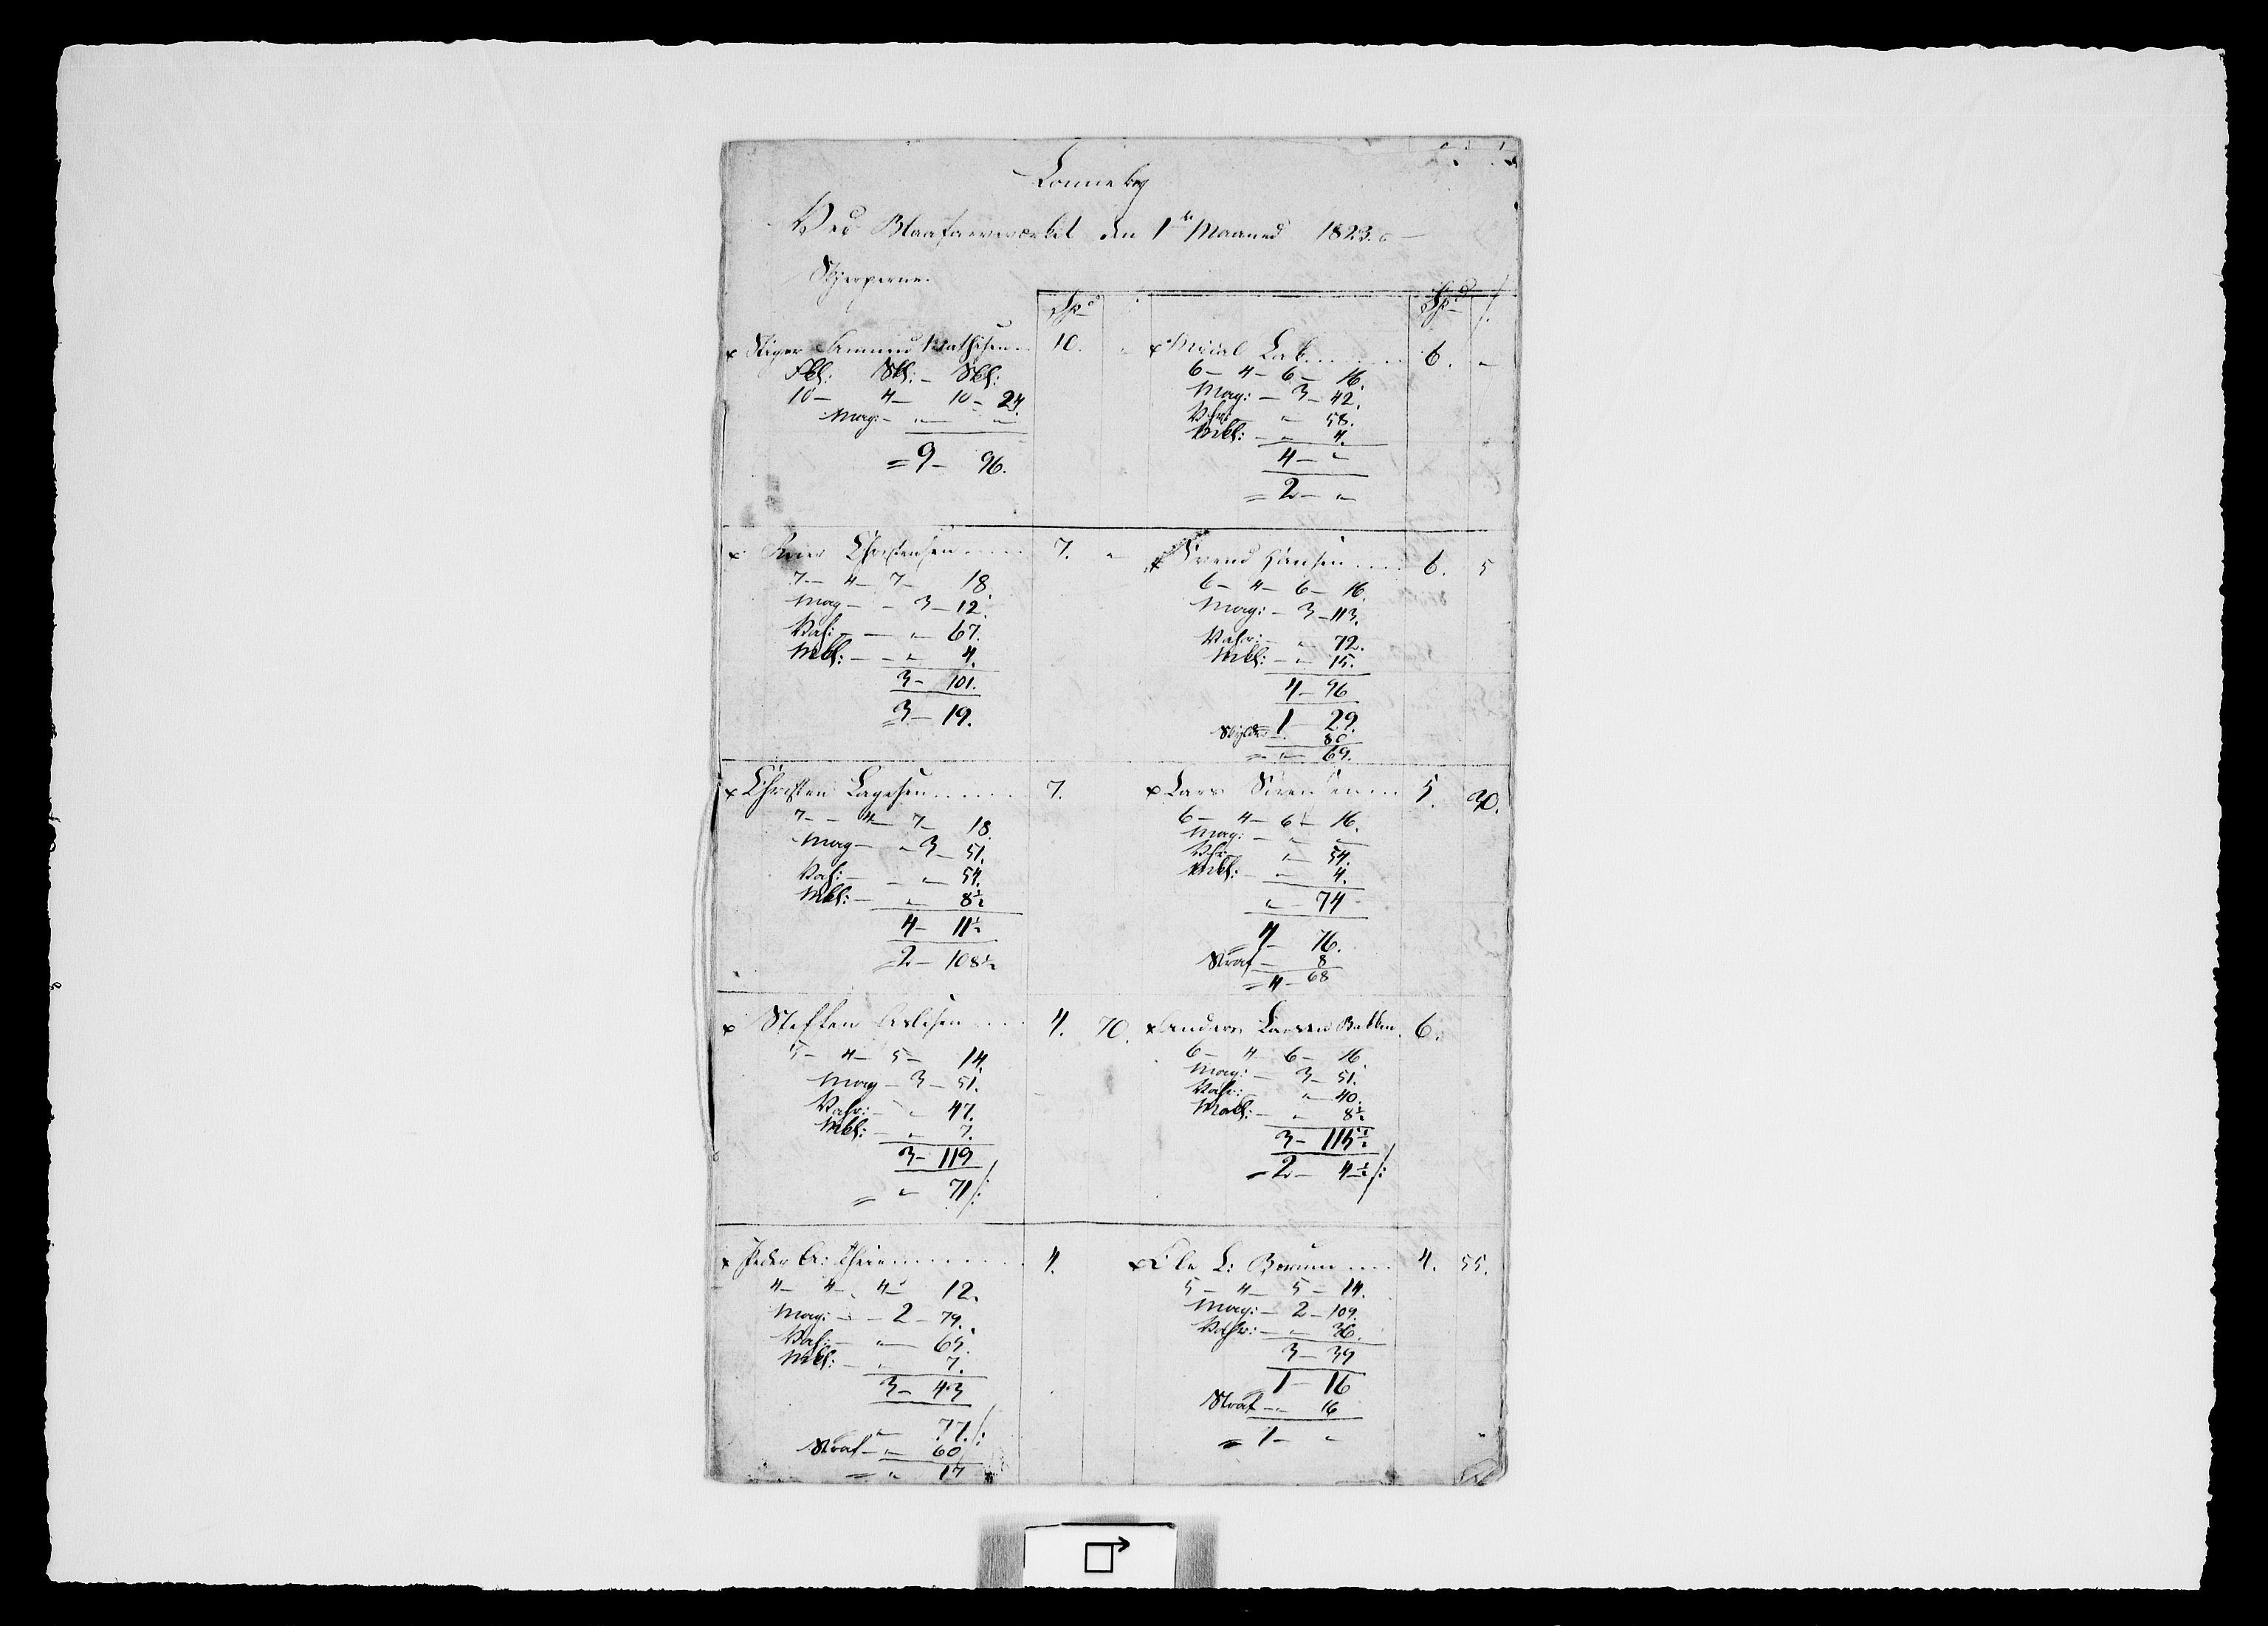 RA, Modums Blaafarveværk, G/Gd/Gdd/L0290, 1823-1826, s. 2